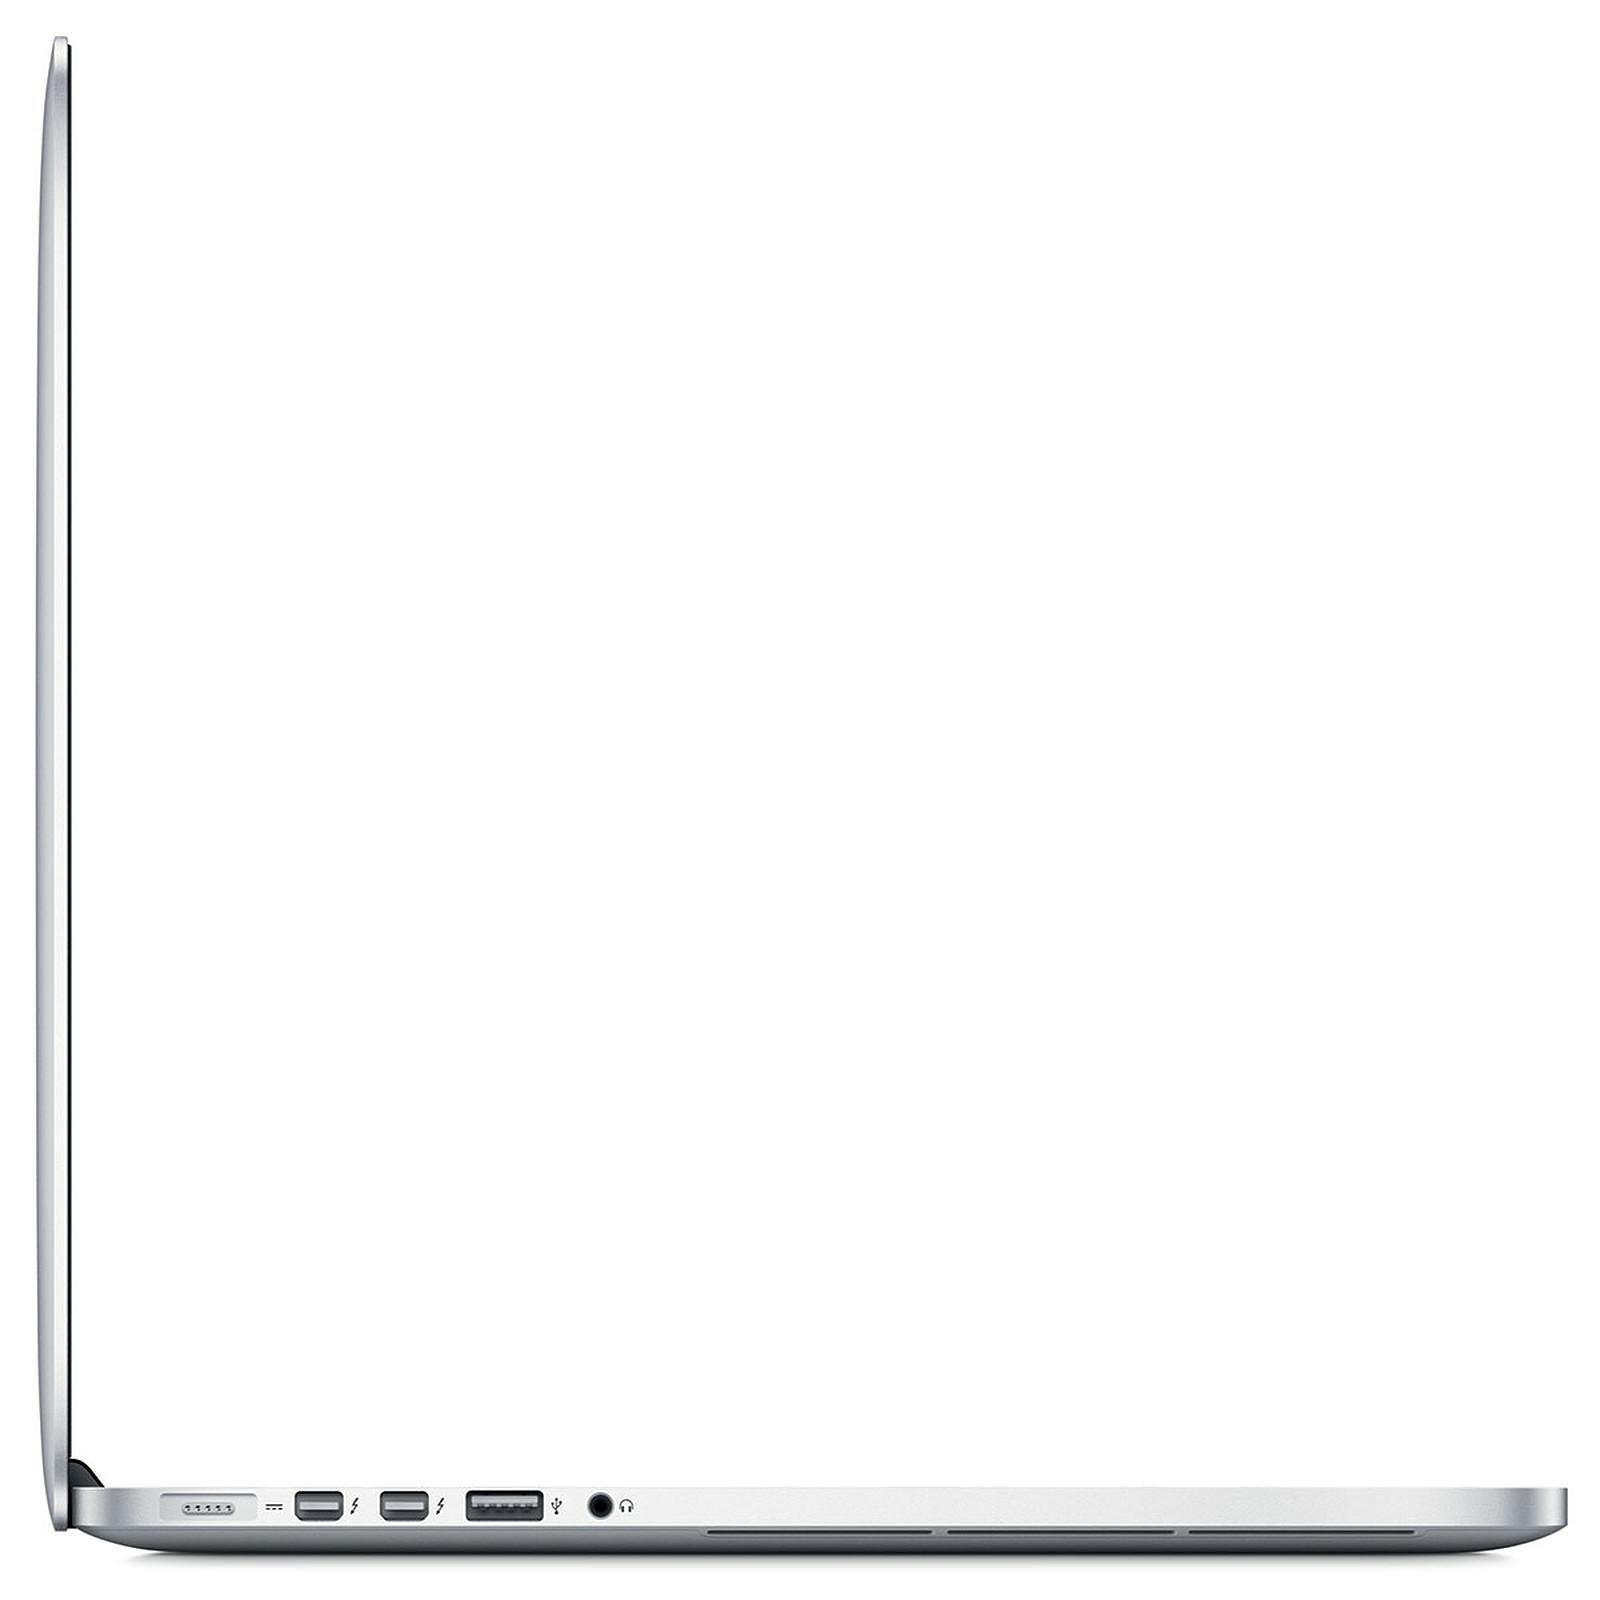 MacBook Pro Retina 15,4-tum (2012) - Core i7 - 8GB - SSD 256 GB AZERTY - Fransk